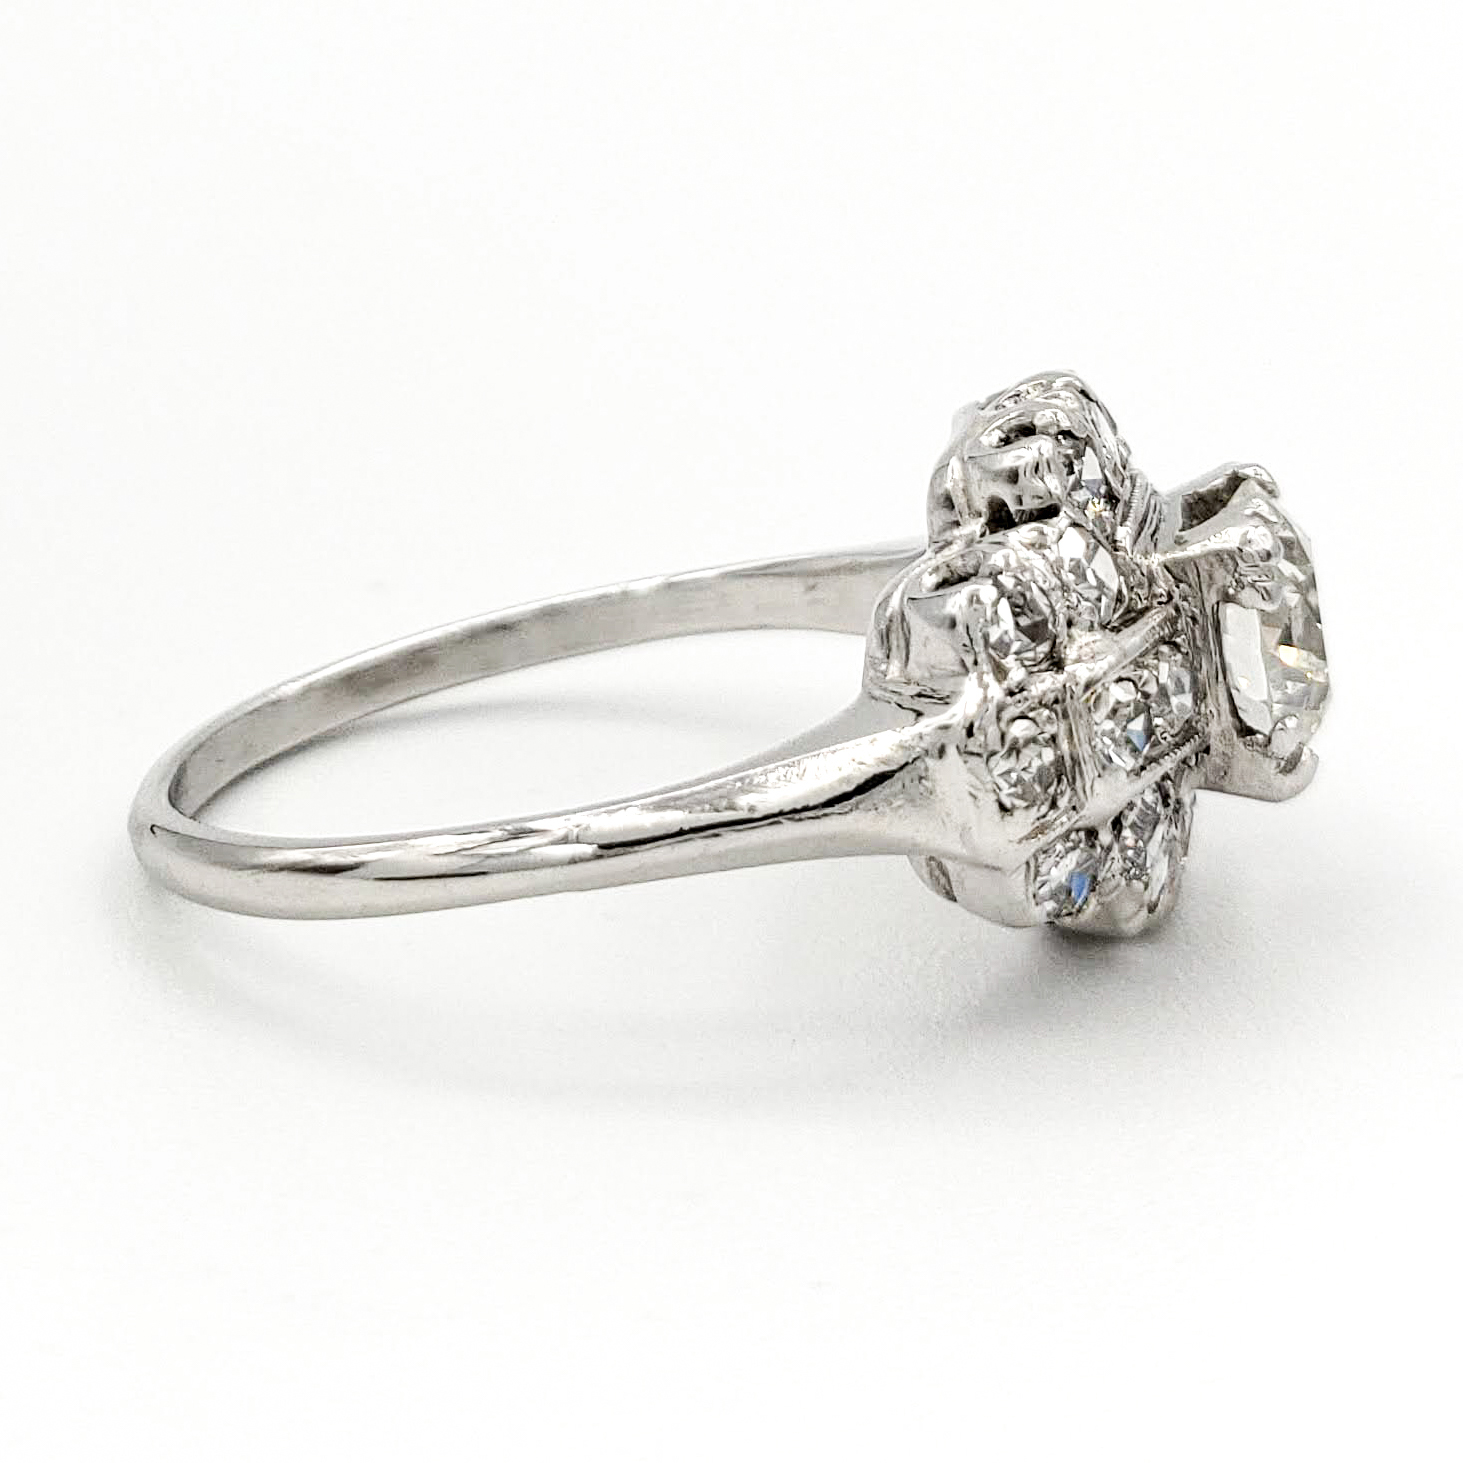 vintage-platinum-engagement-ring-with-0-60-carat-old-european-cut-diamond-egl-g-vs2